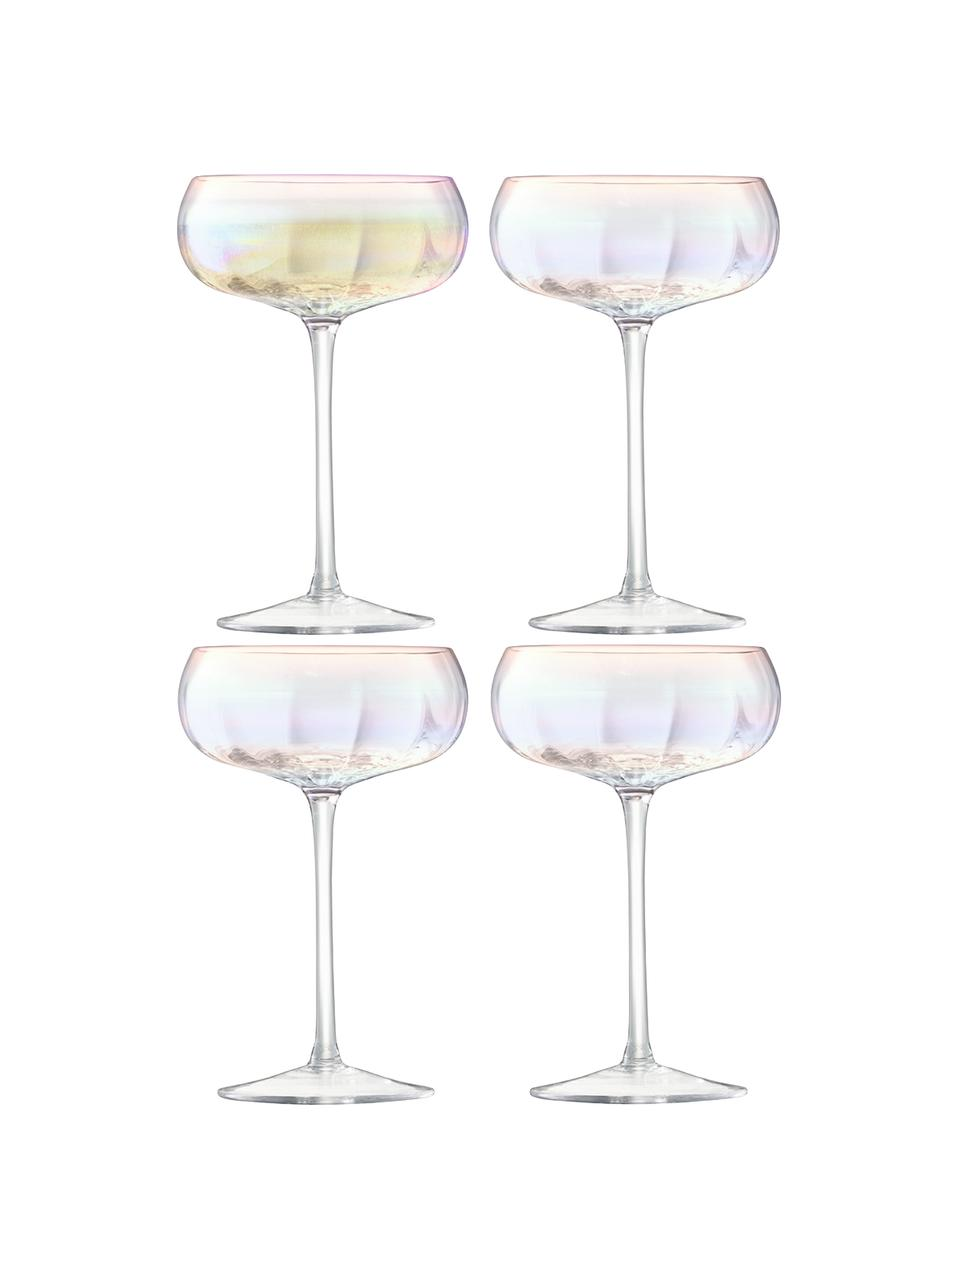 Mondgeblazen champagneglazen Pearl met een glinsterende parelmoer glans, 4 stuks, Glas, Parelmoerglans, Ø 11 x H 16 cm